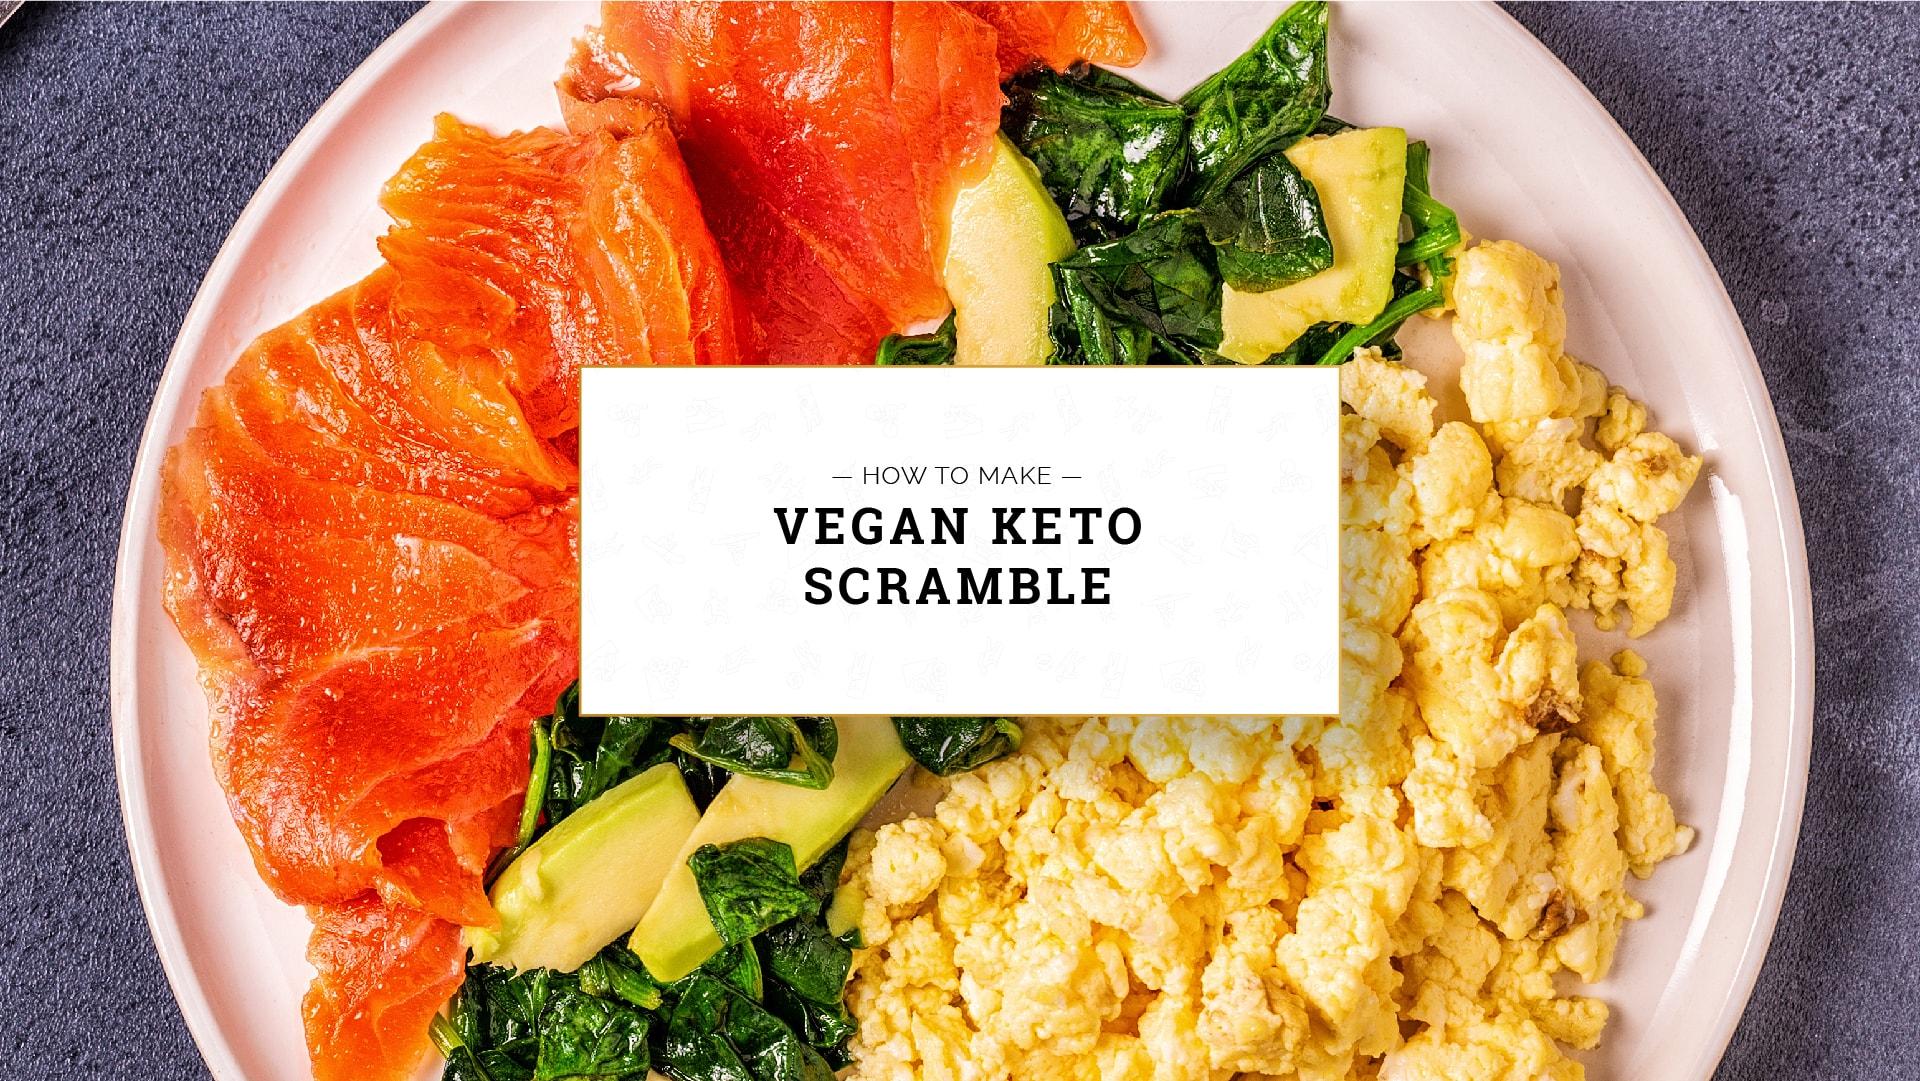 Vegan Keto Scramble